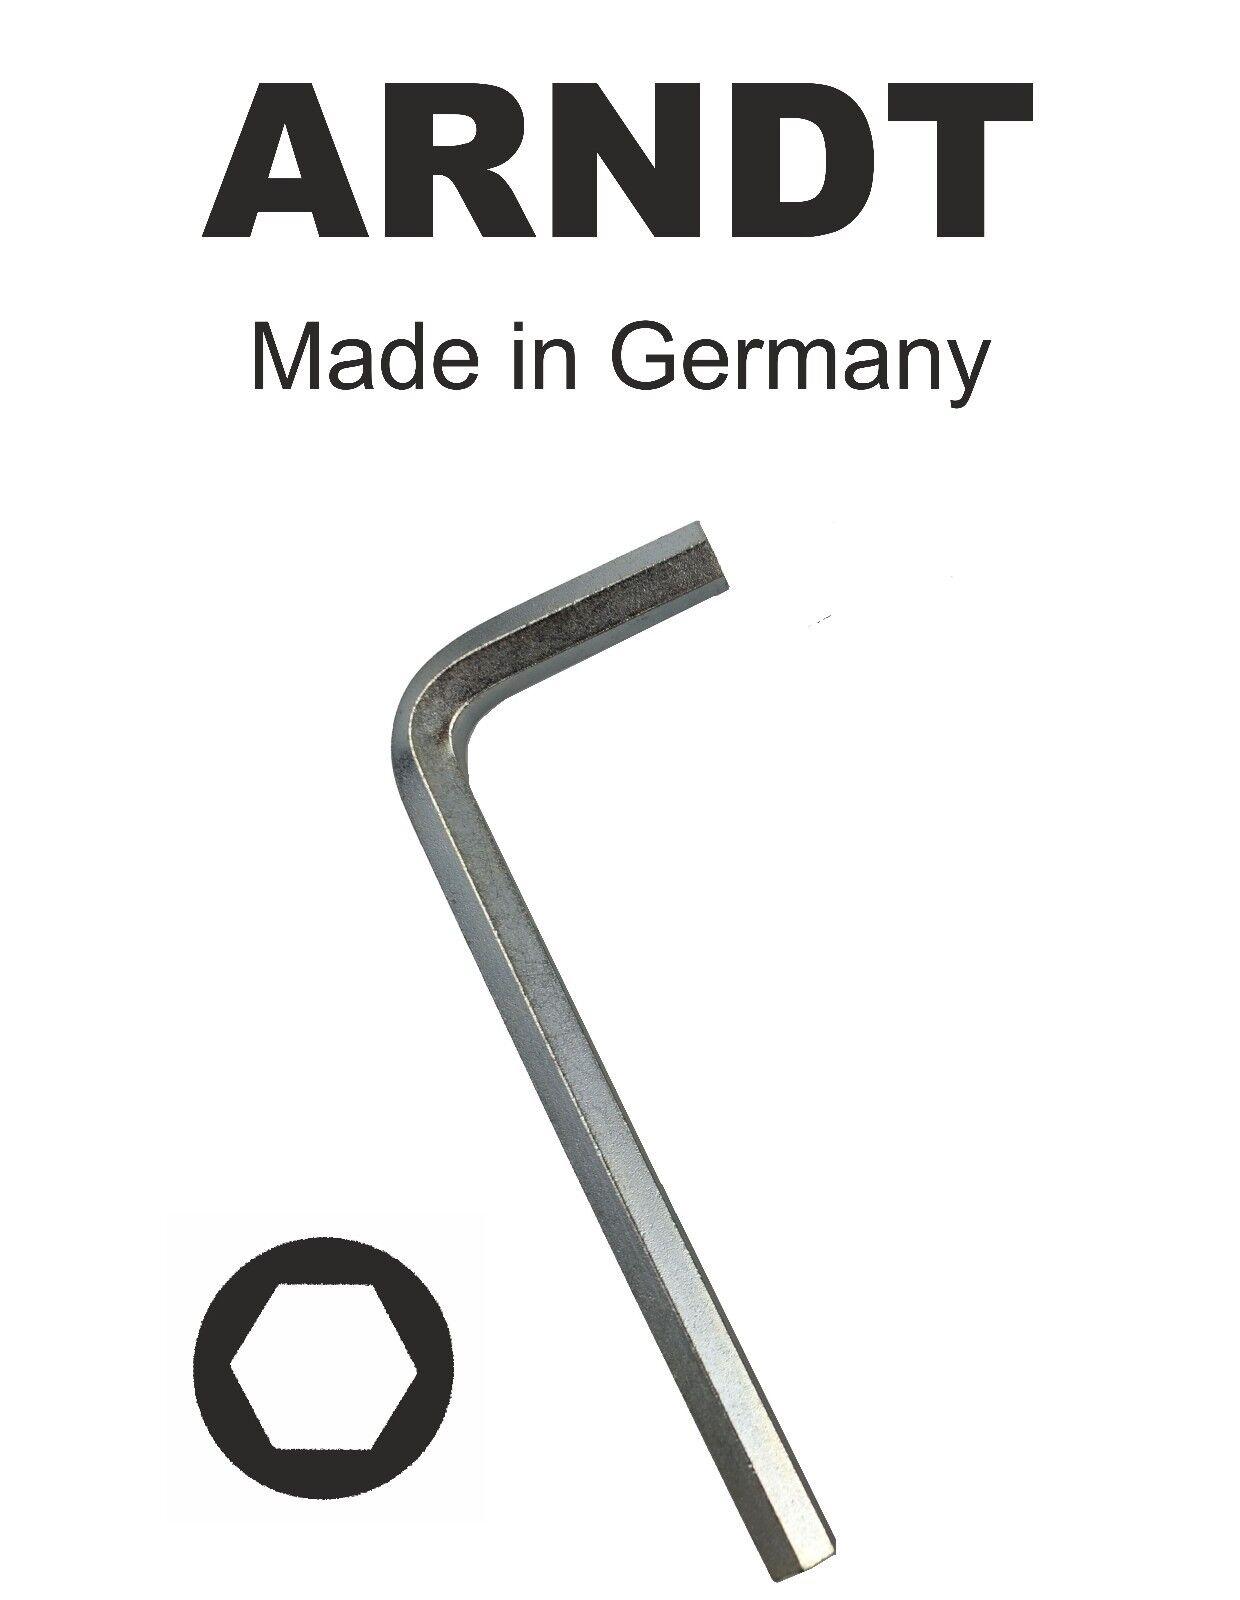 Allen Key Hex Key Hex Wrench Key Hexagonal Keys ZINC PLATED CR VANAD Steel 911-C